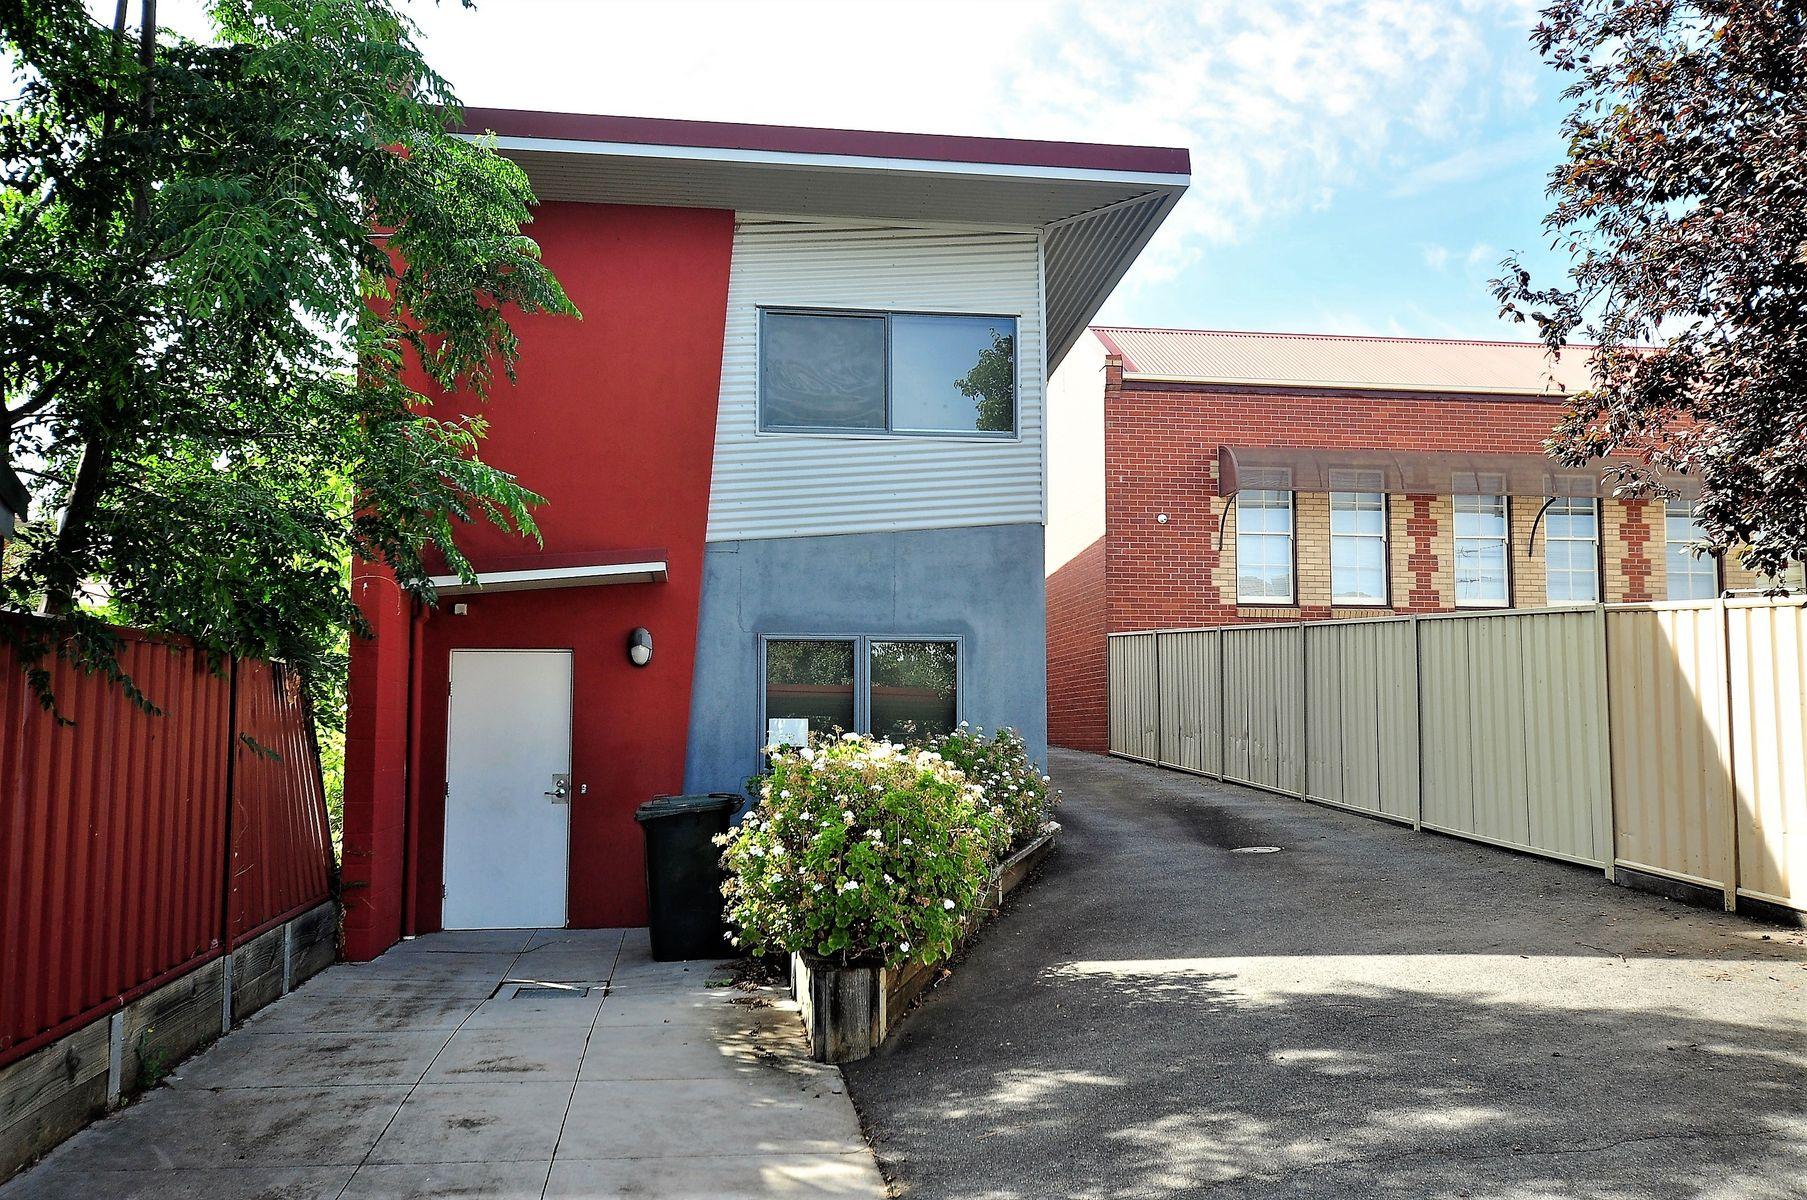 112 Queen Street, Bendigo, VIC 3550